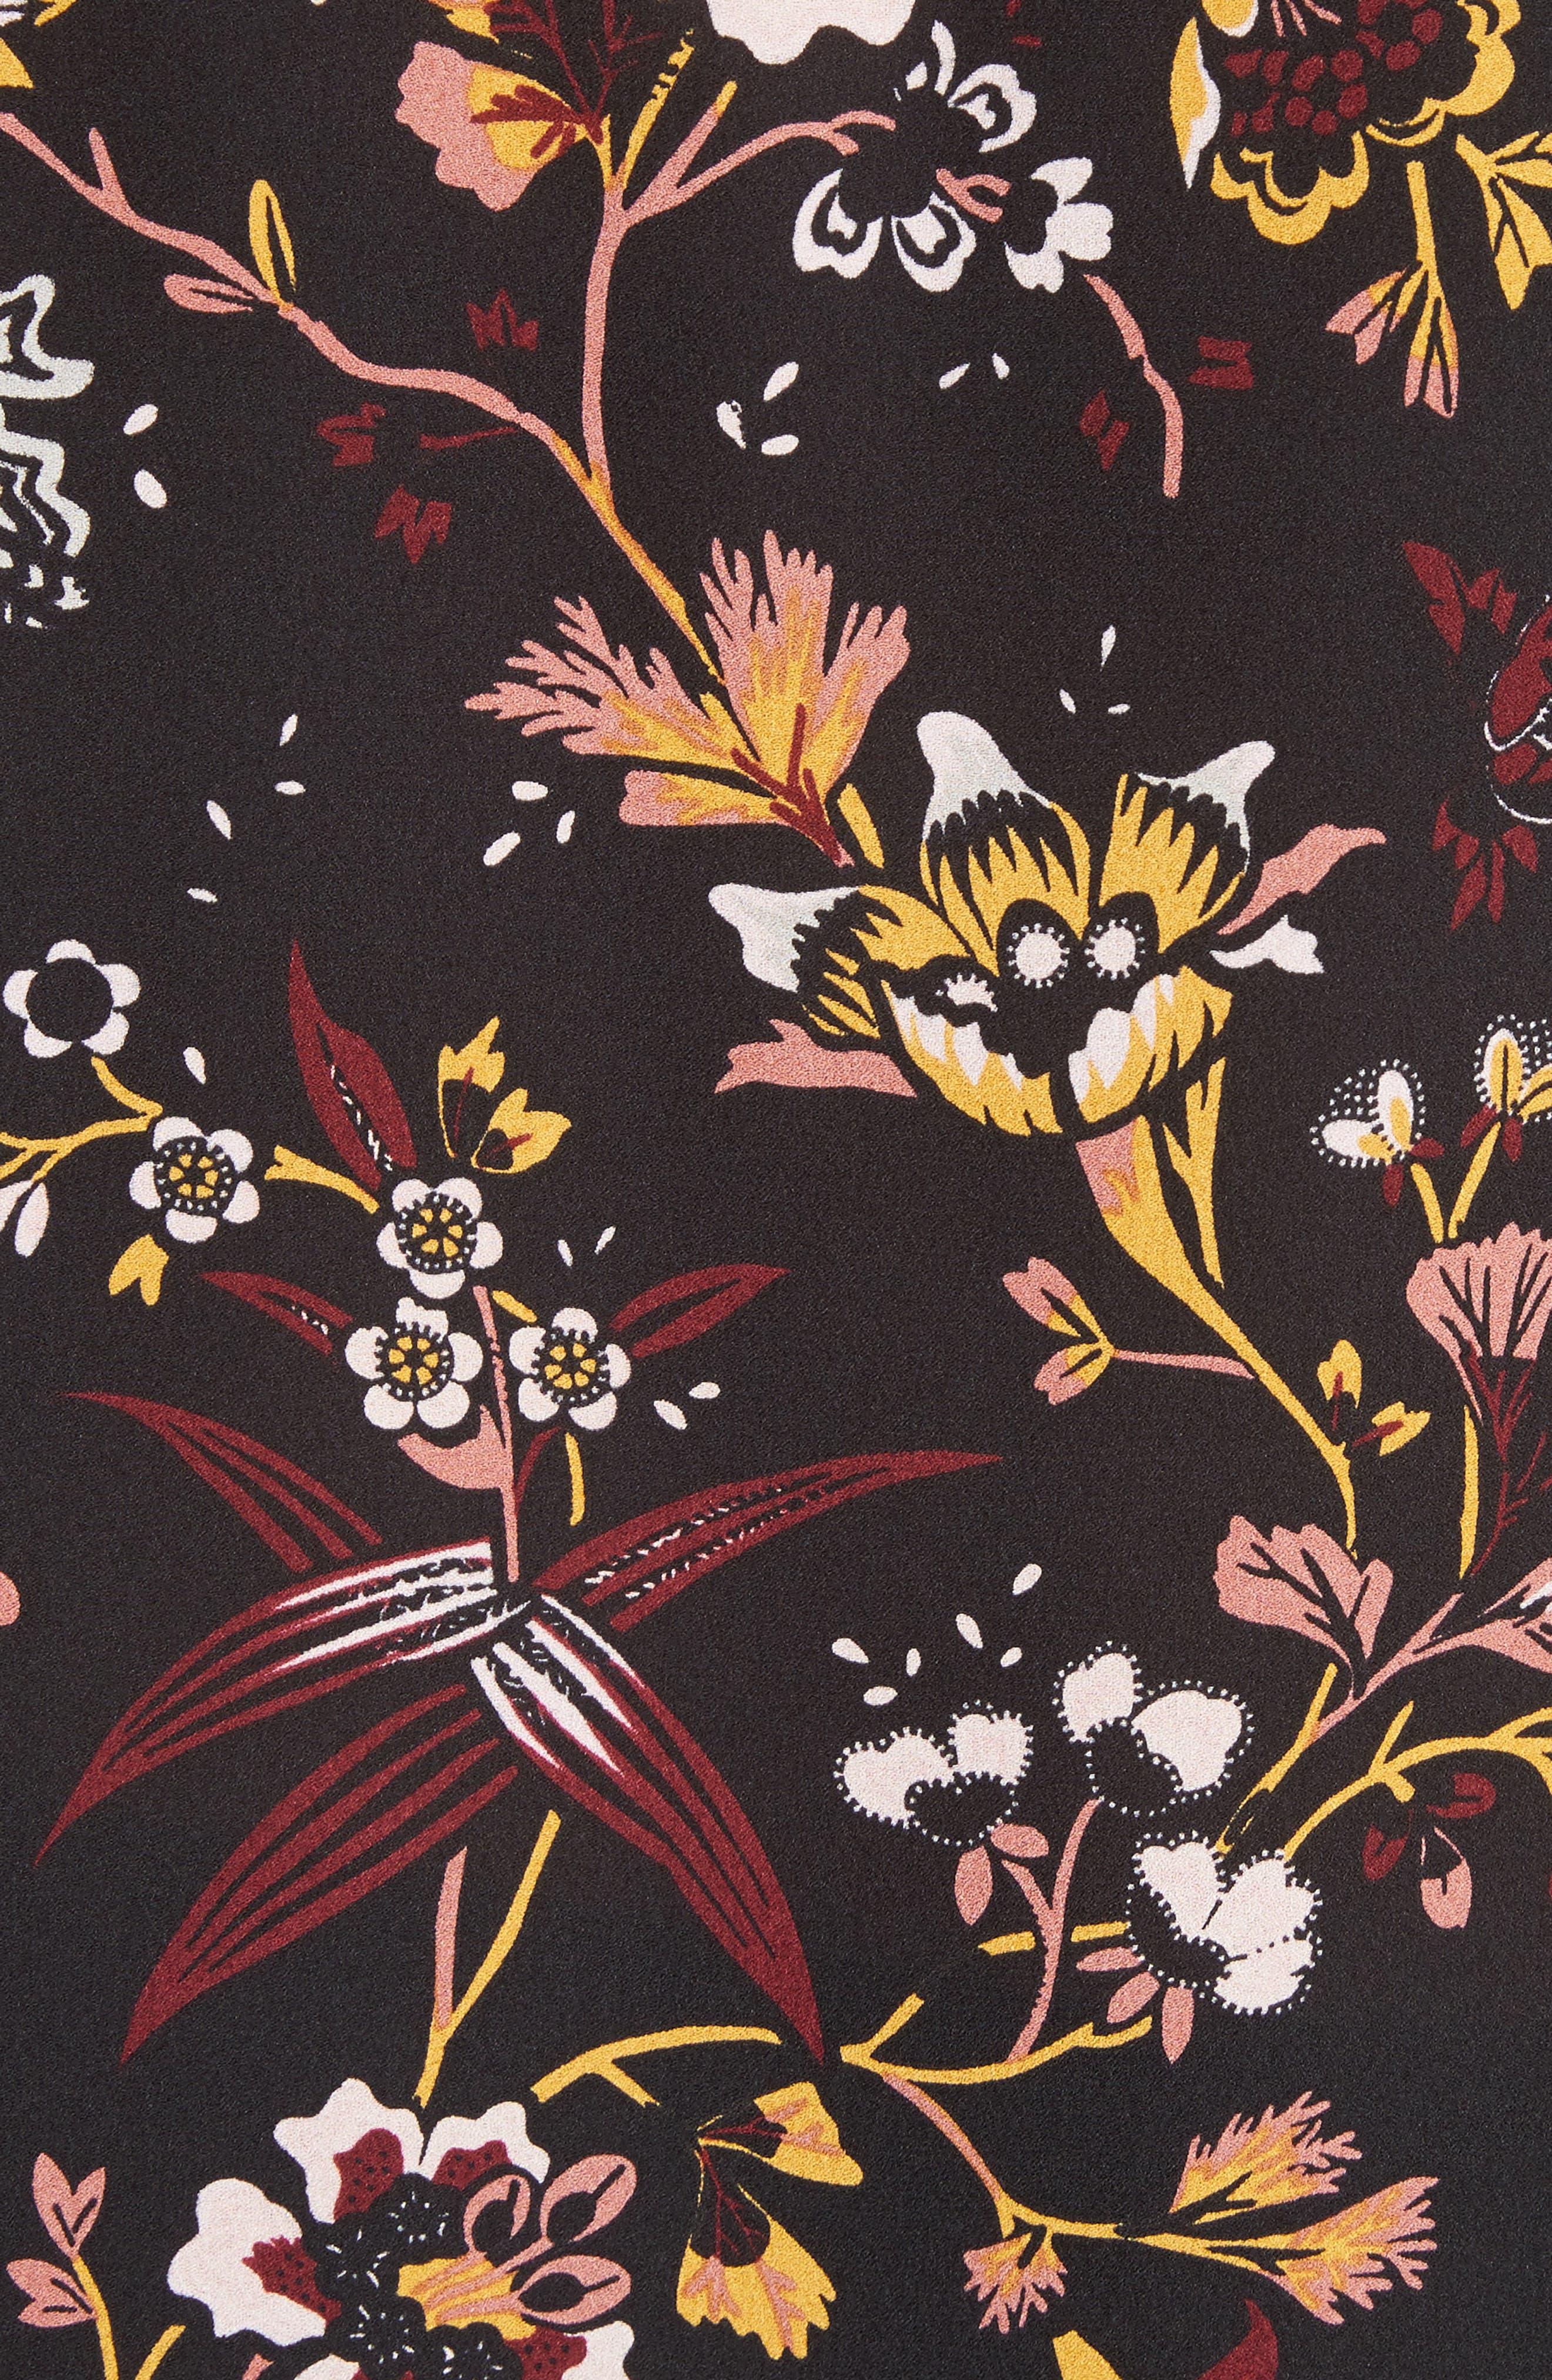 Keith Floral Print Silk Top,                             Alternate thumbnail 5, color,                             002